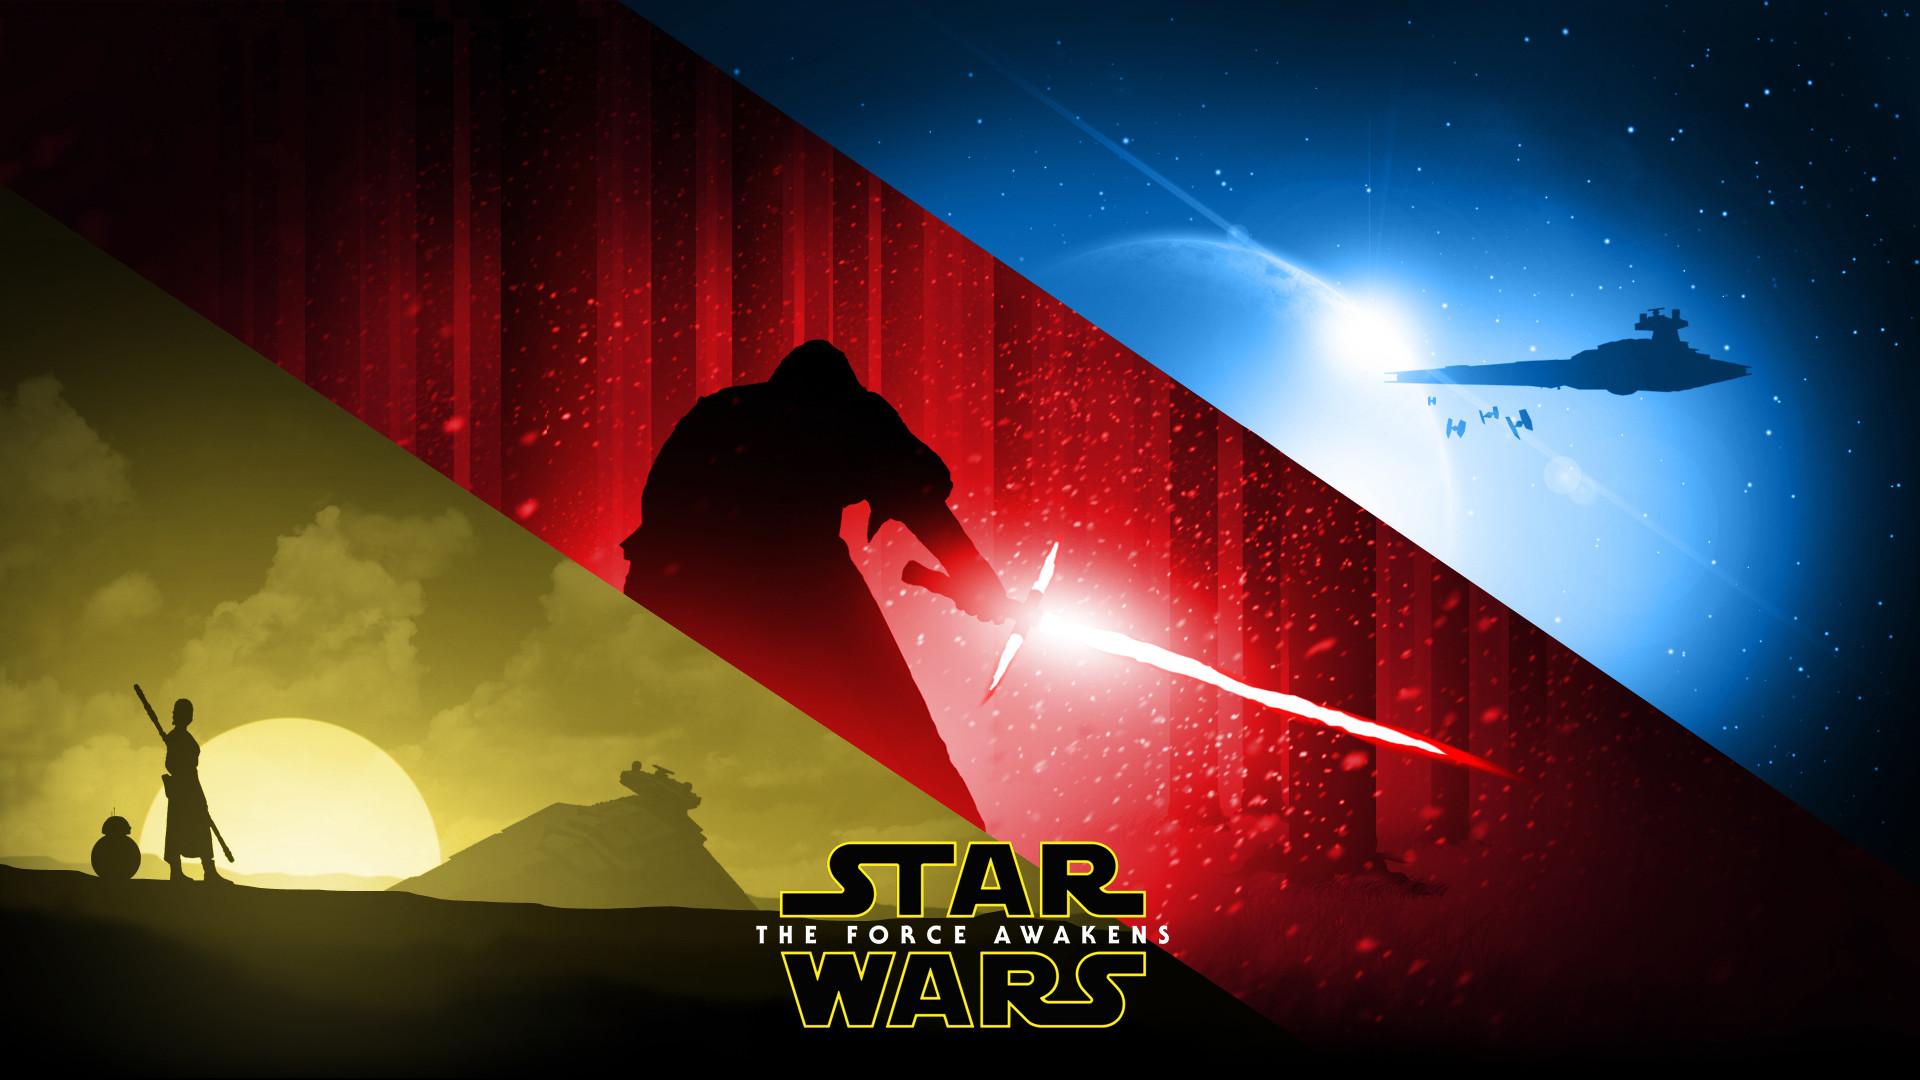 Star Wars The Force Awakens Wallpaper Data Src Star Wars Wallpaper The Force Awakens 1920x1080 Wallpaper Teahub Io